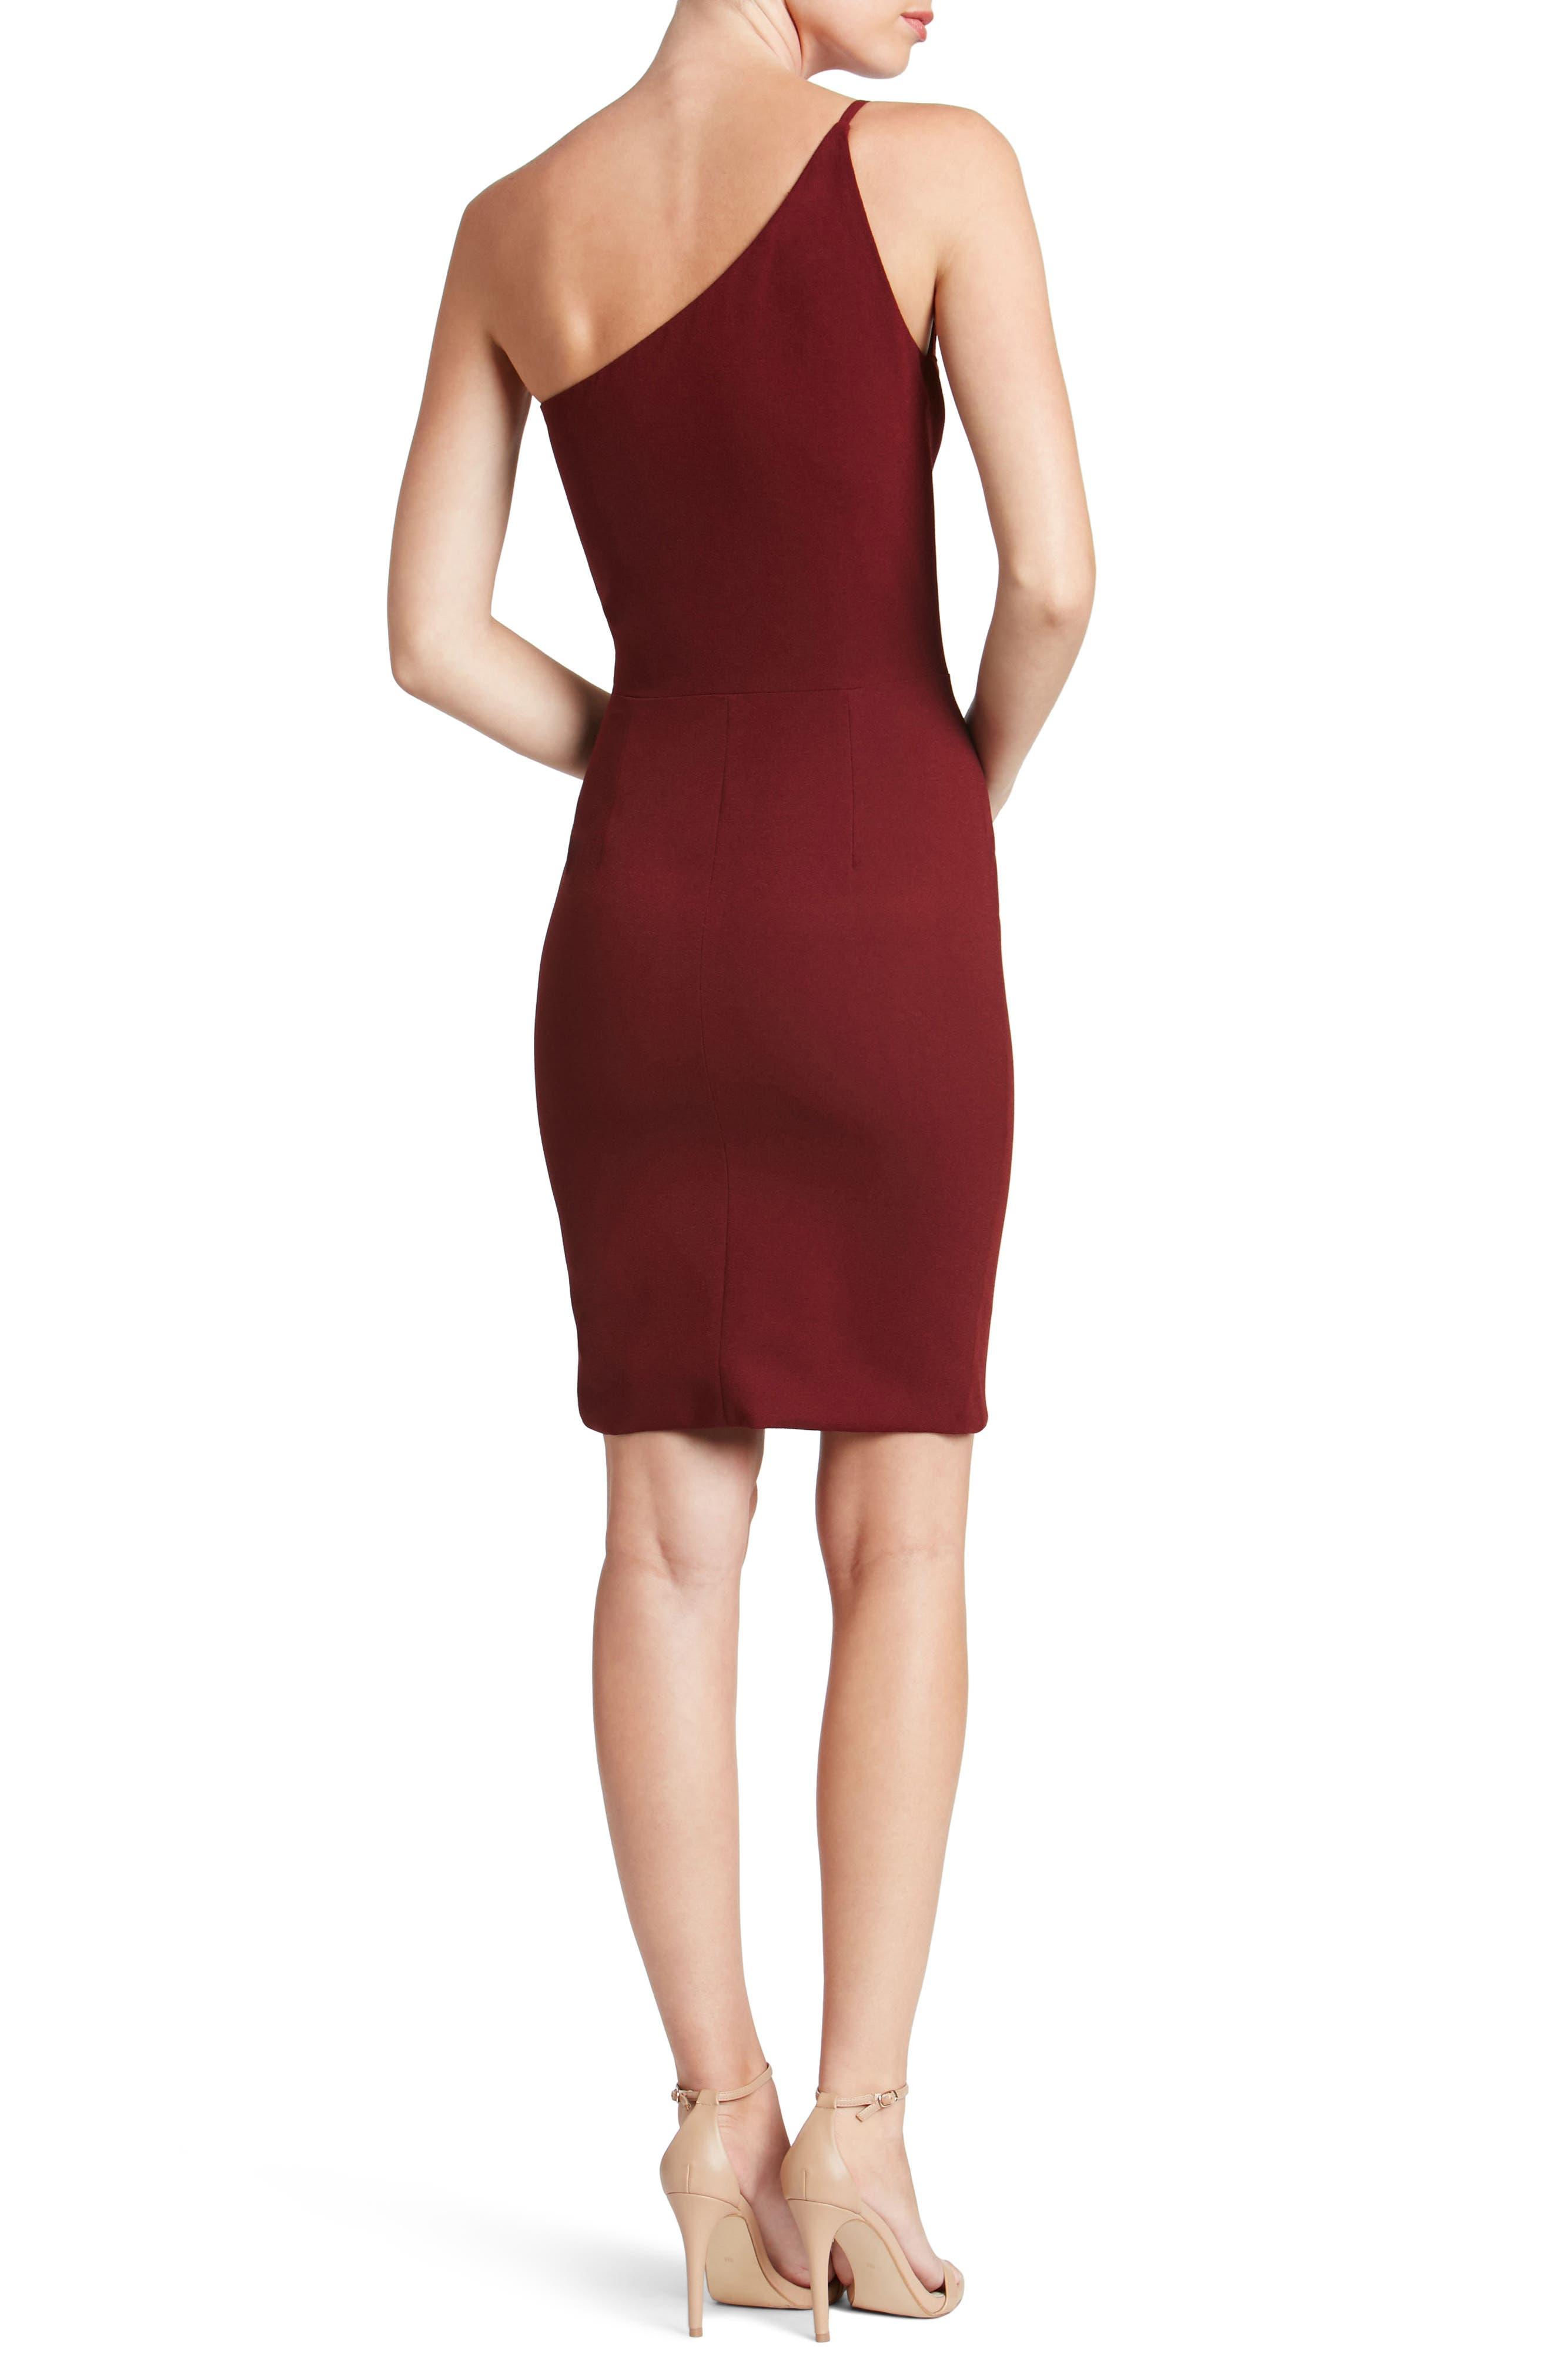 Jennifer One-Shoulder Body-Con Dress,                             Alternate thumbnail 4, color,